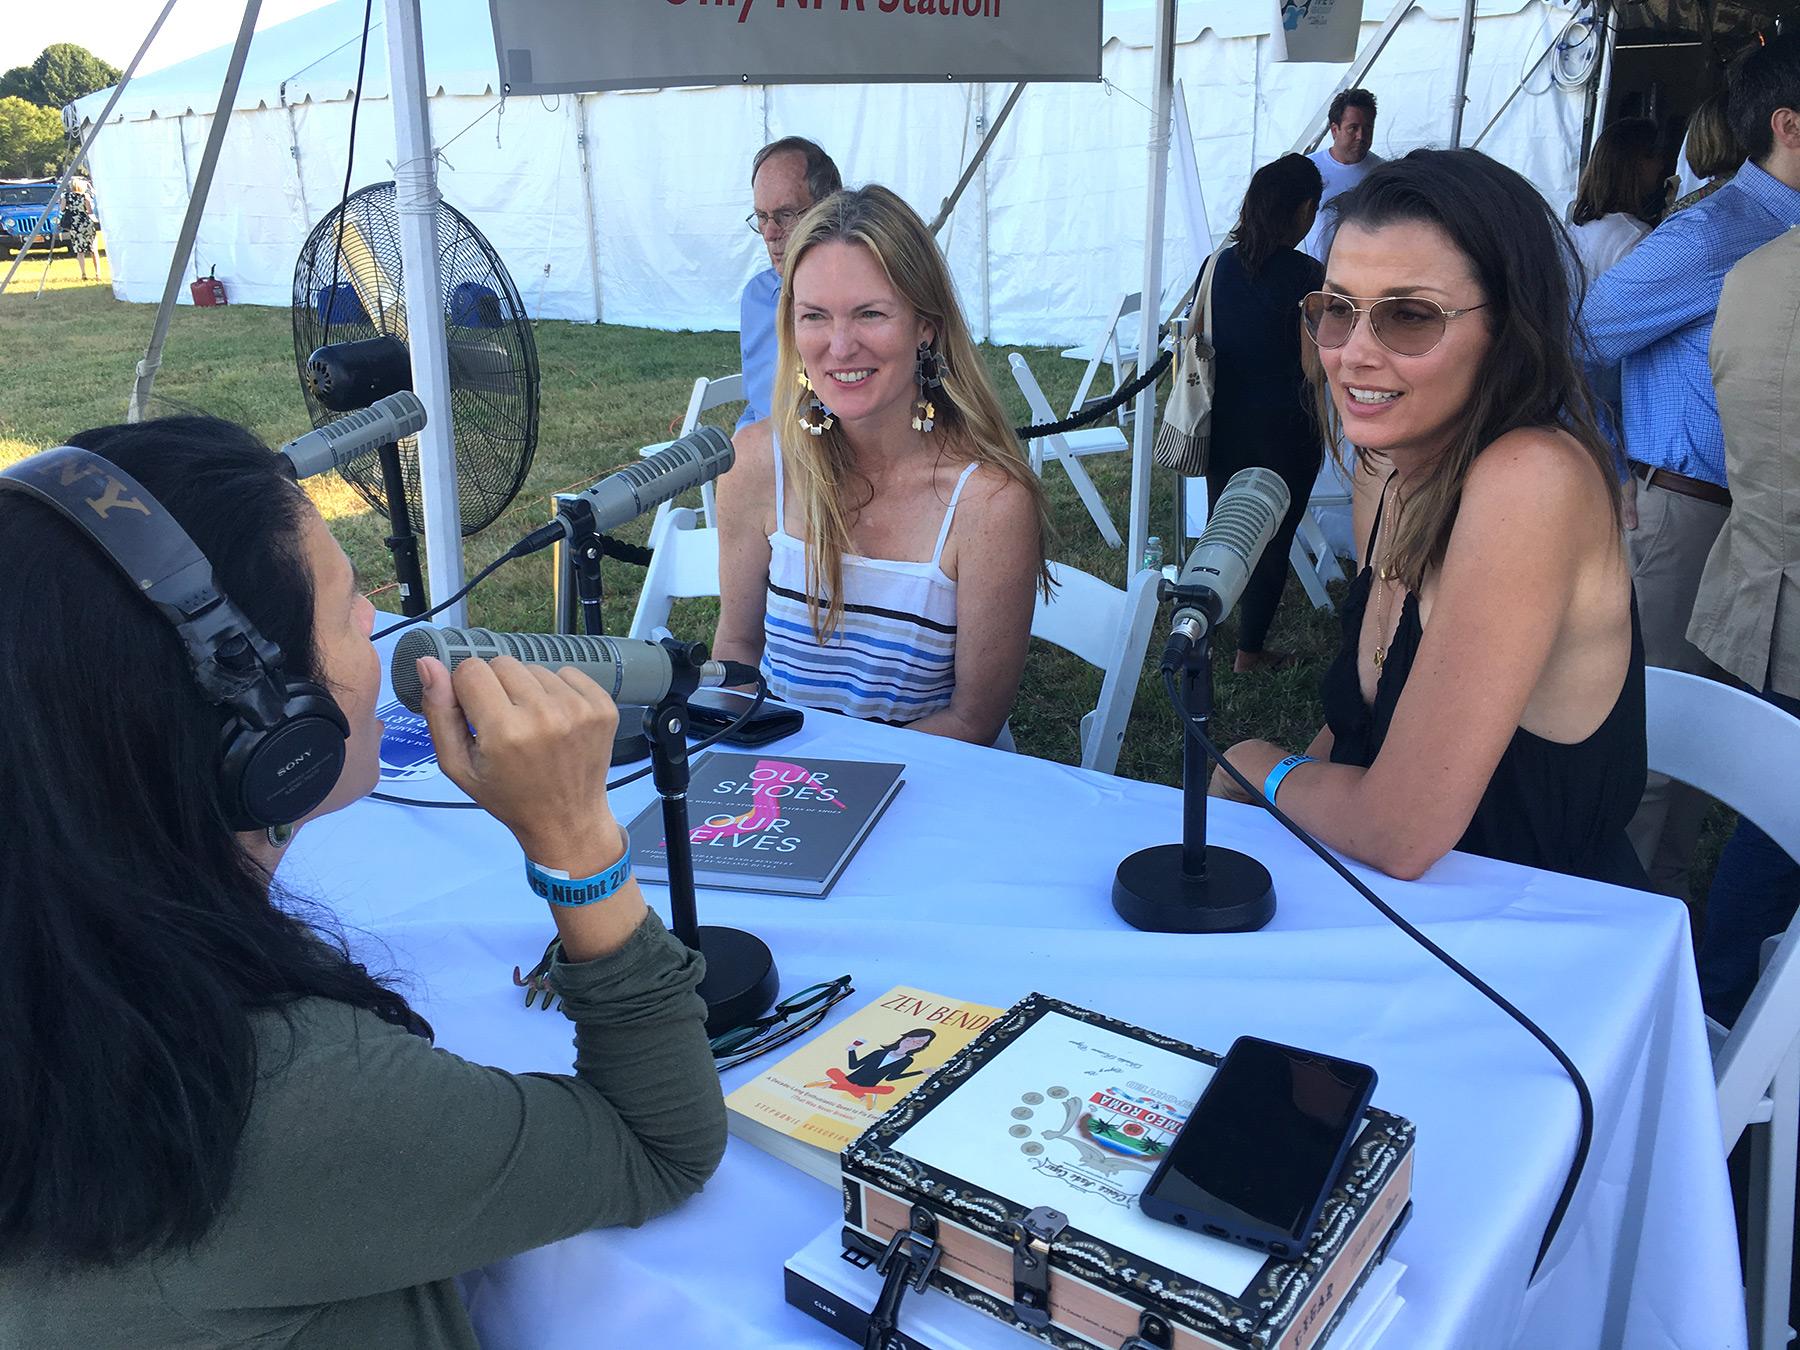 with Amanda Benchley and Bridget Moynahan. Photo credit: Kelly Loeffler